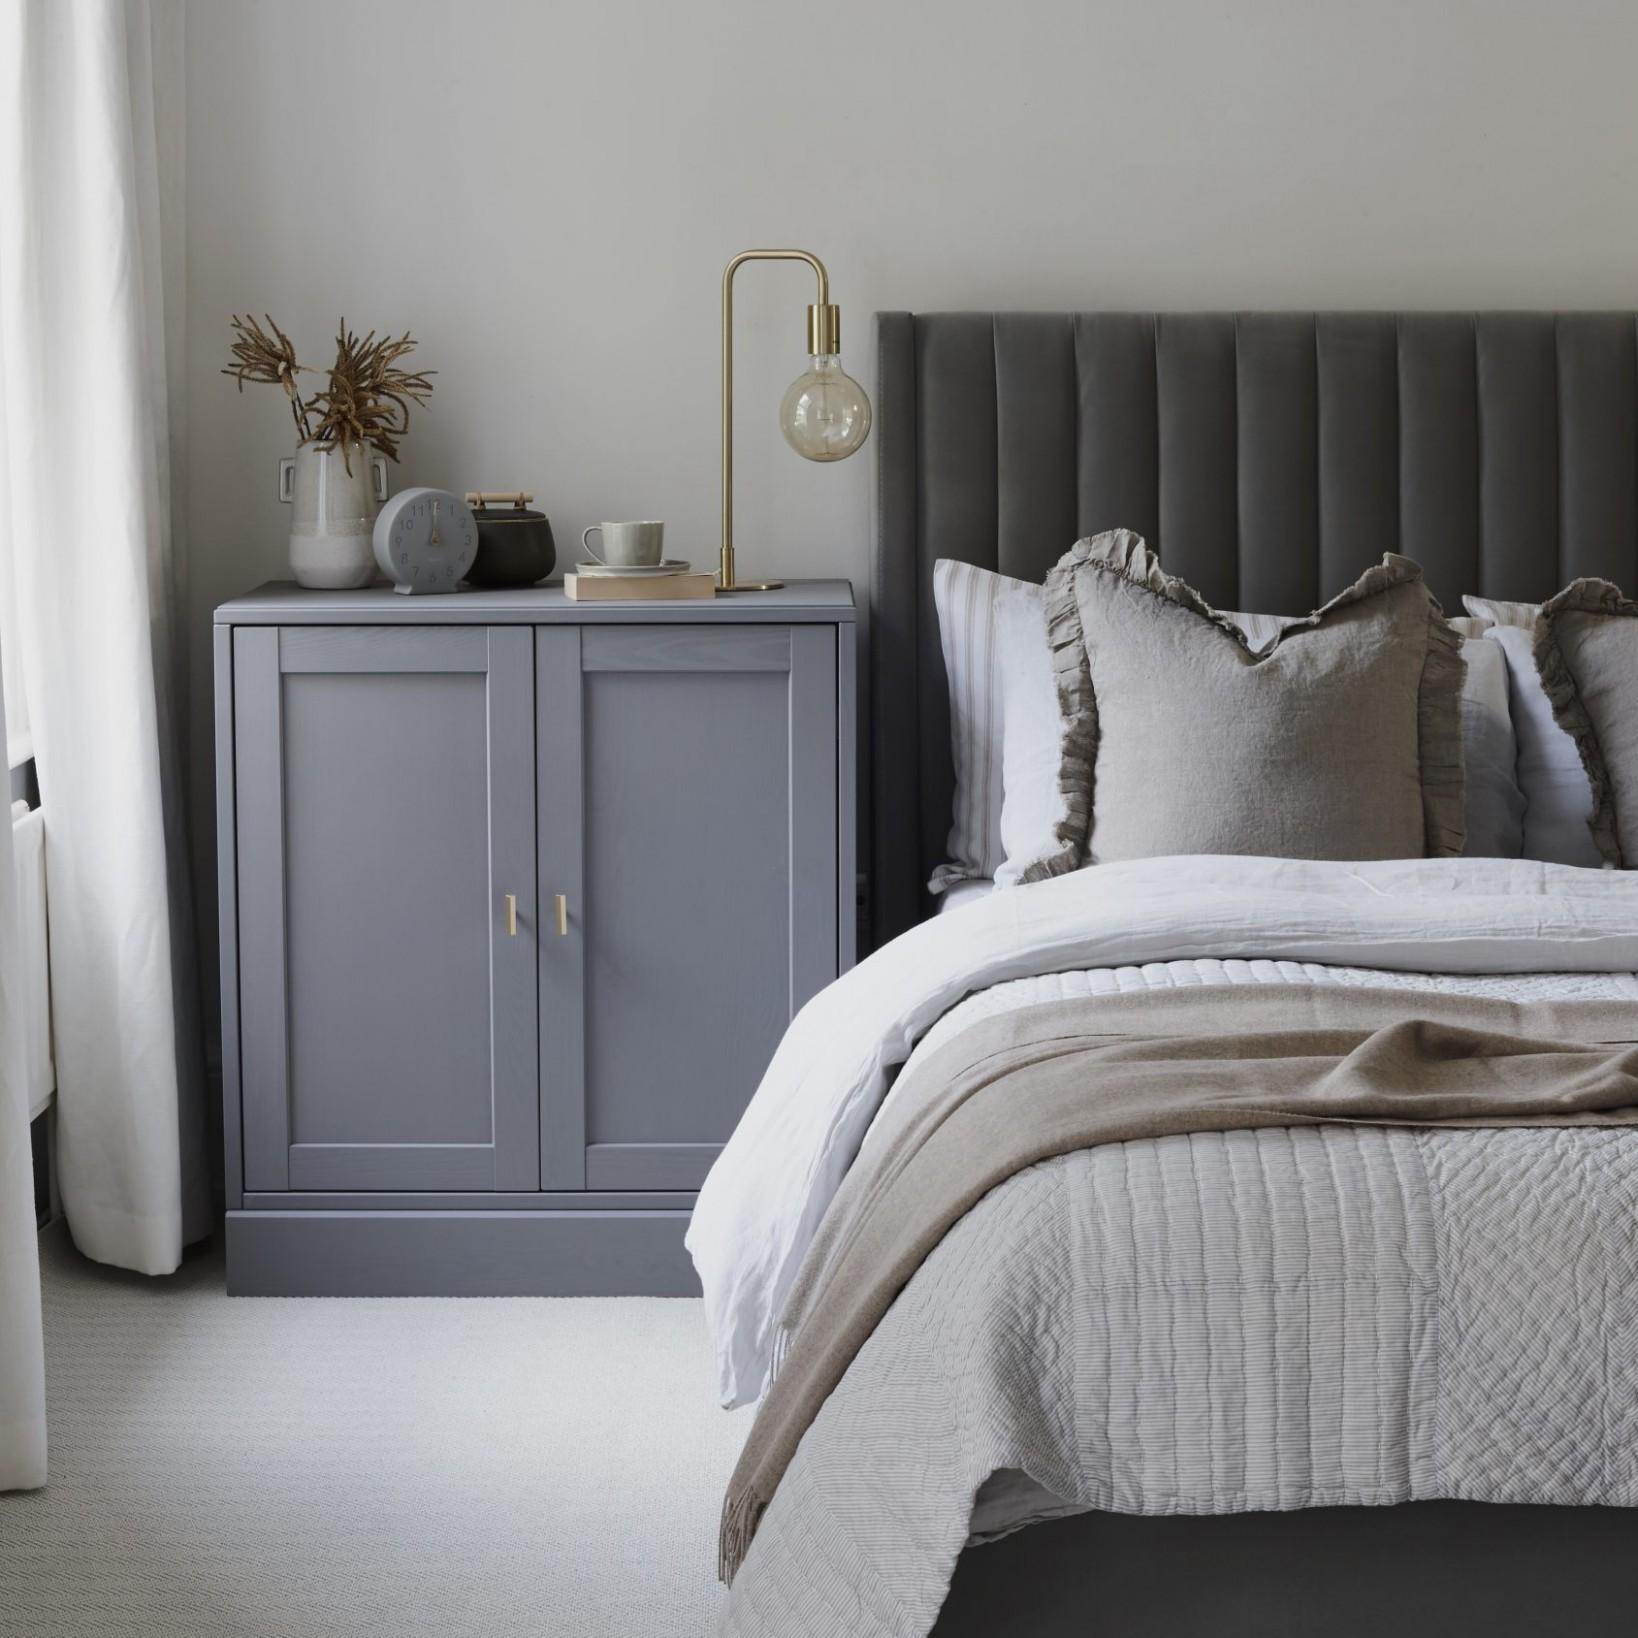 Grey bedroom ideas – grey bedroom decorating – grey colour scheme - Bedroom Ideas Grey And White